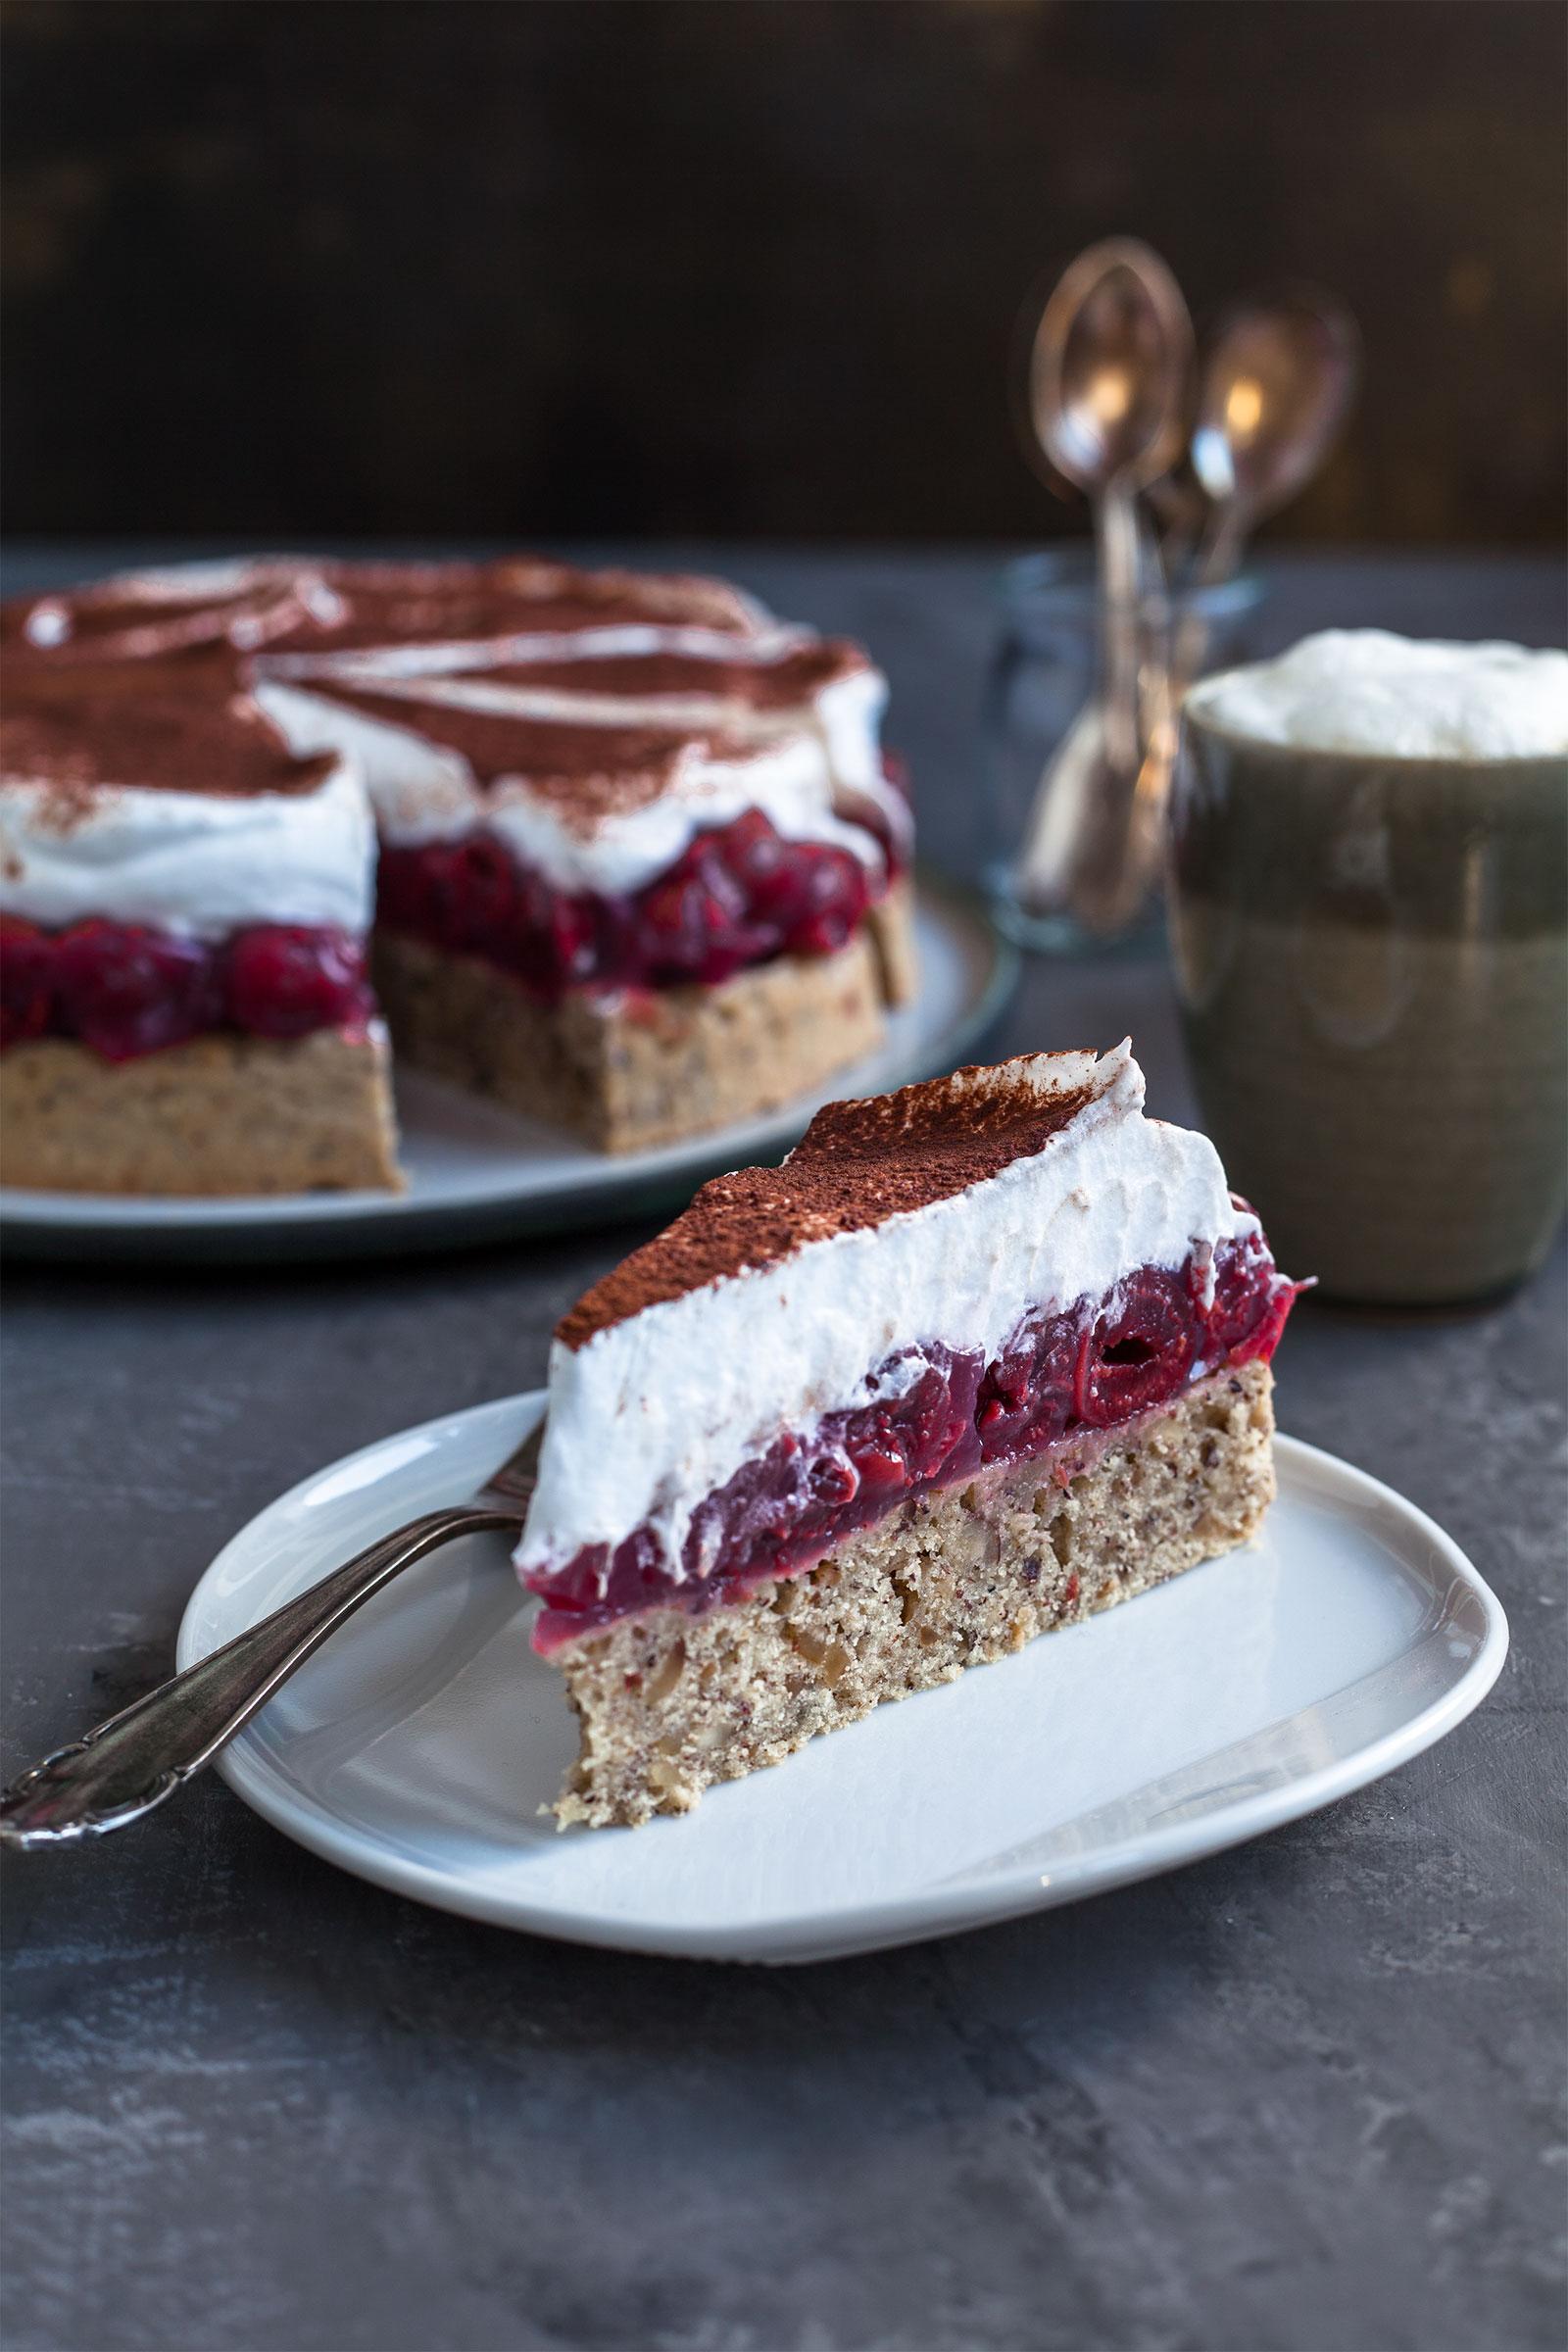 Haselnuss kirsch torte